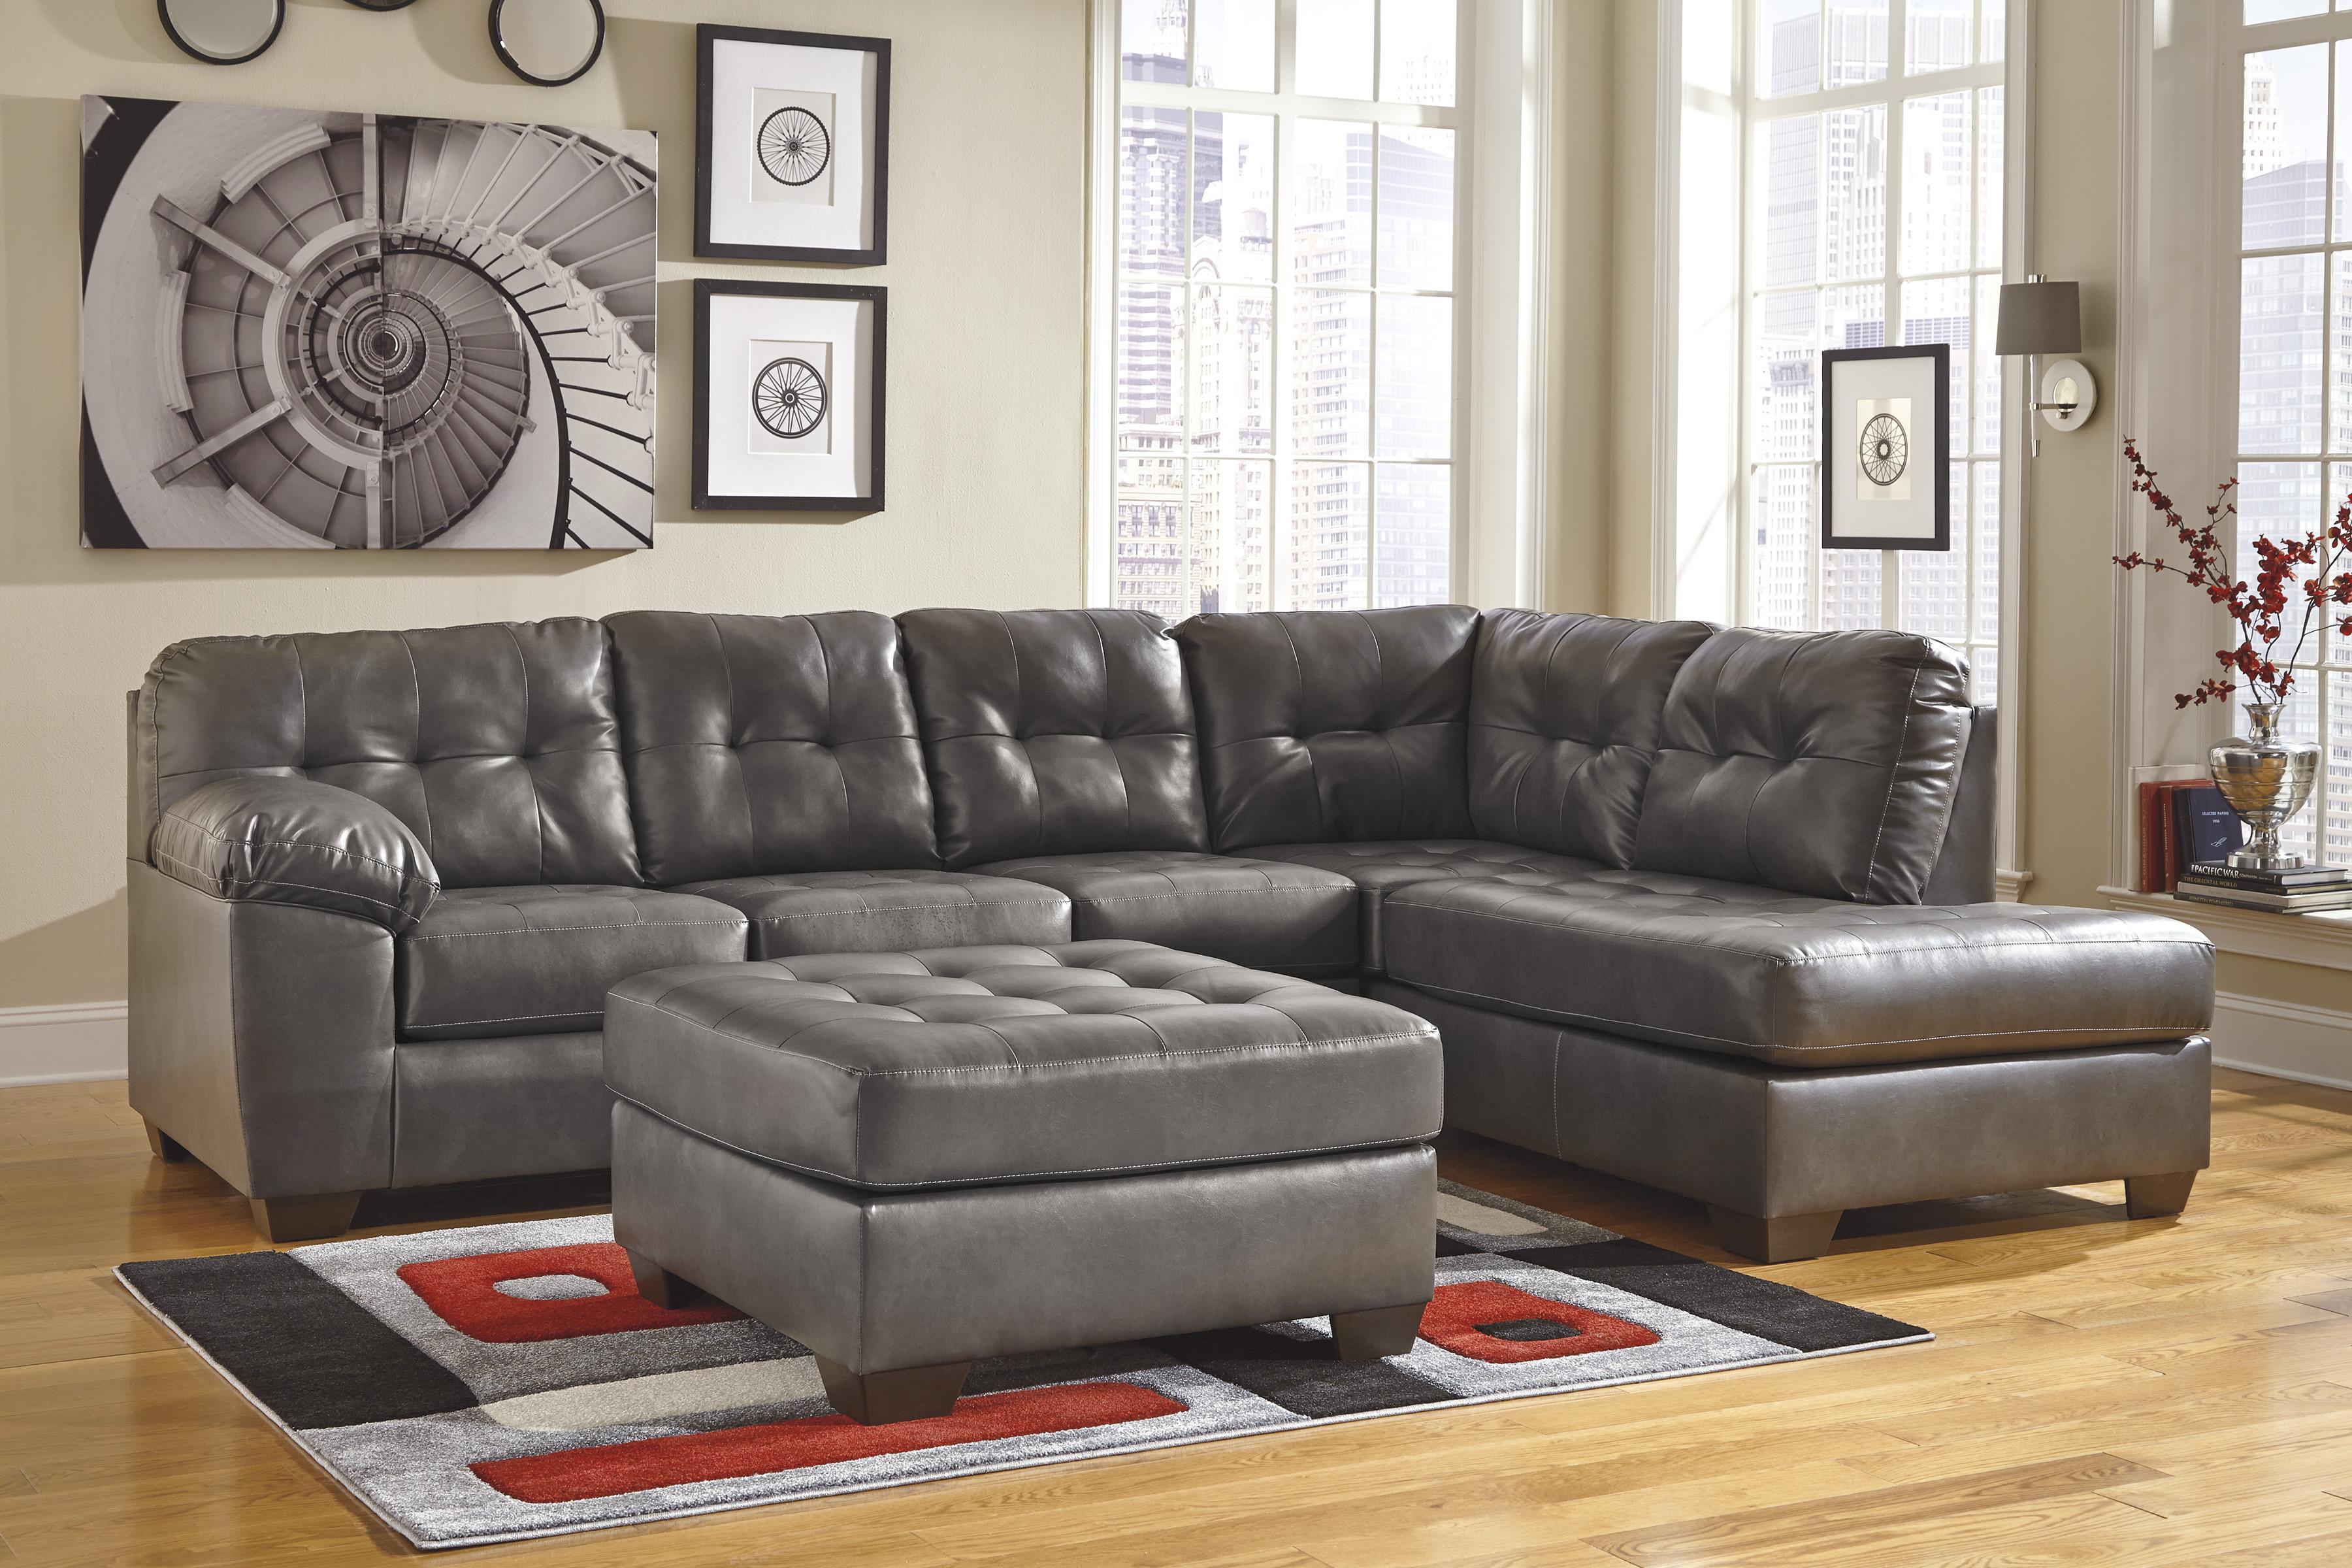 sofa sectional ashley durablend deep australia signature design by